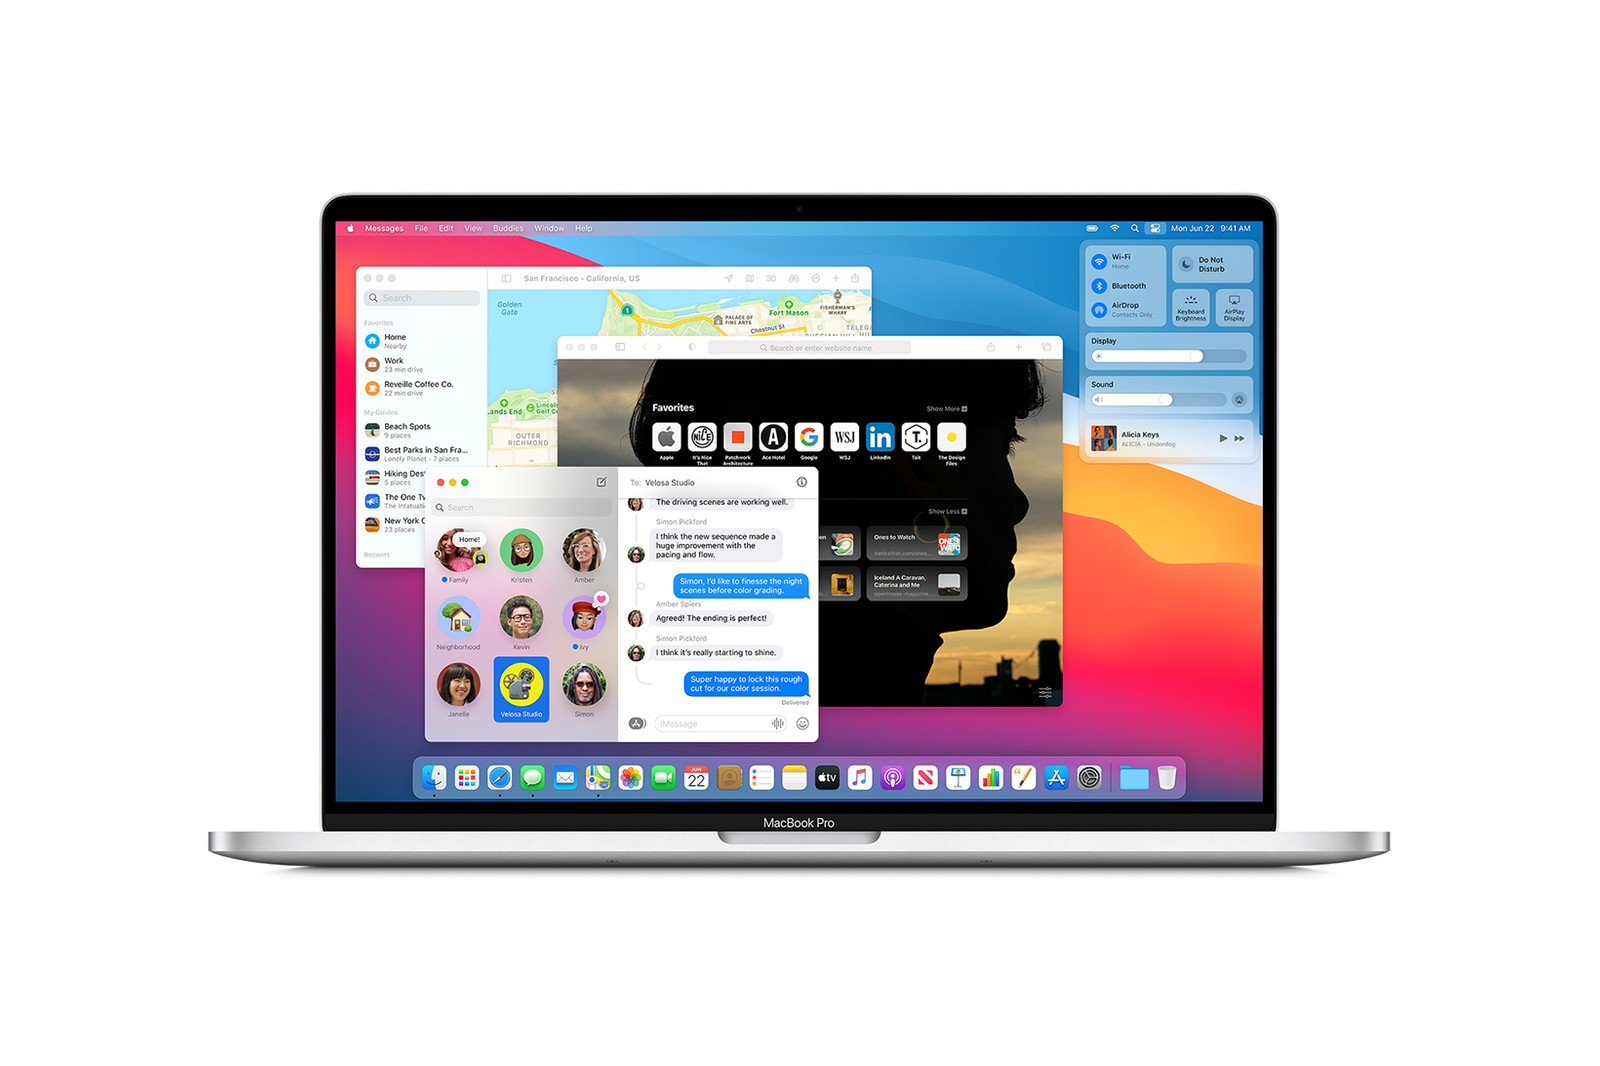 Apple iPhone iOS 14 MacBook MacOS Big Sur